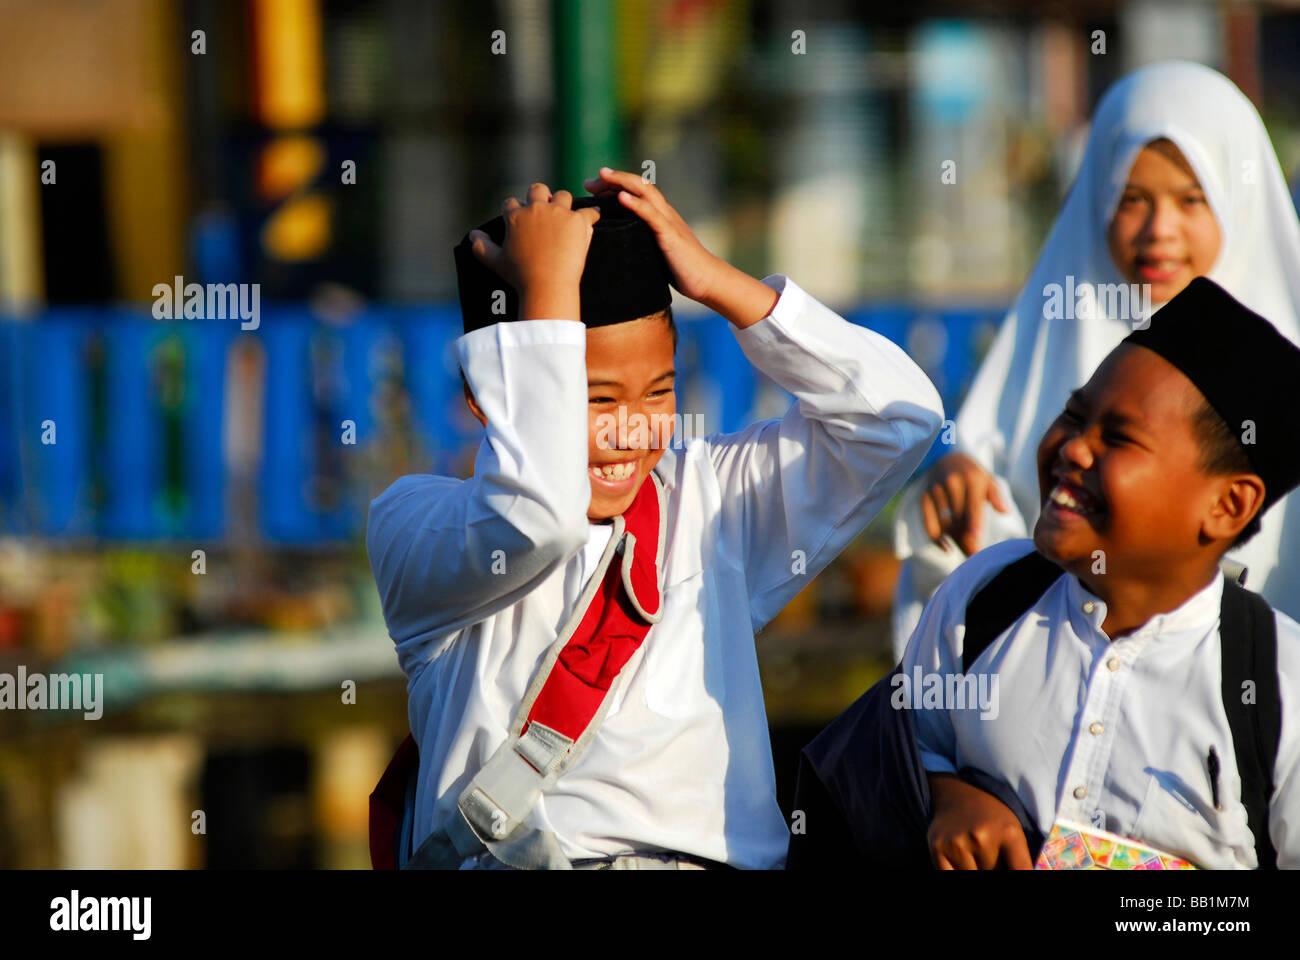 BRUNEI, Bandar Seri Begawan. Portrait of asian muslim schoolboys wearing white shirt, playing - Stock Image